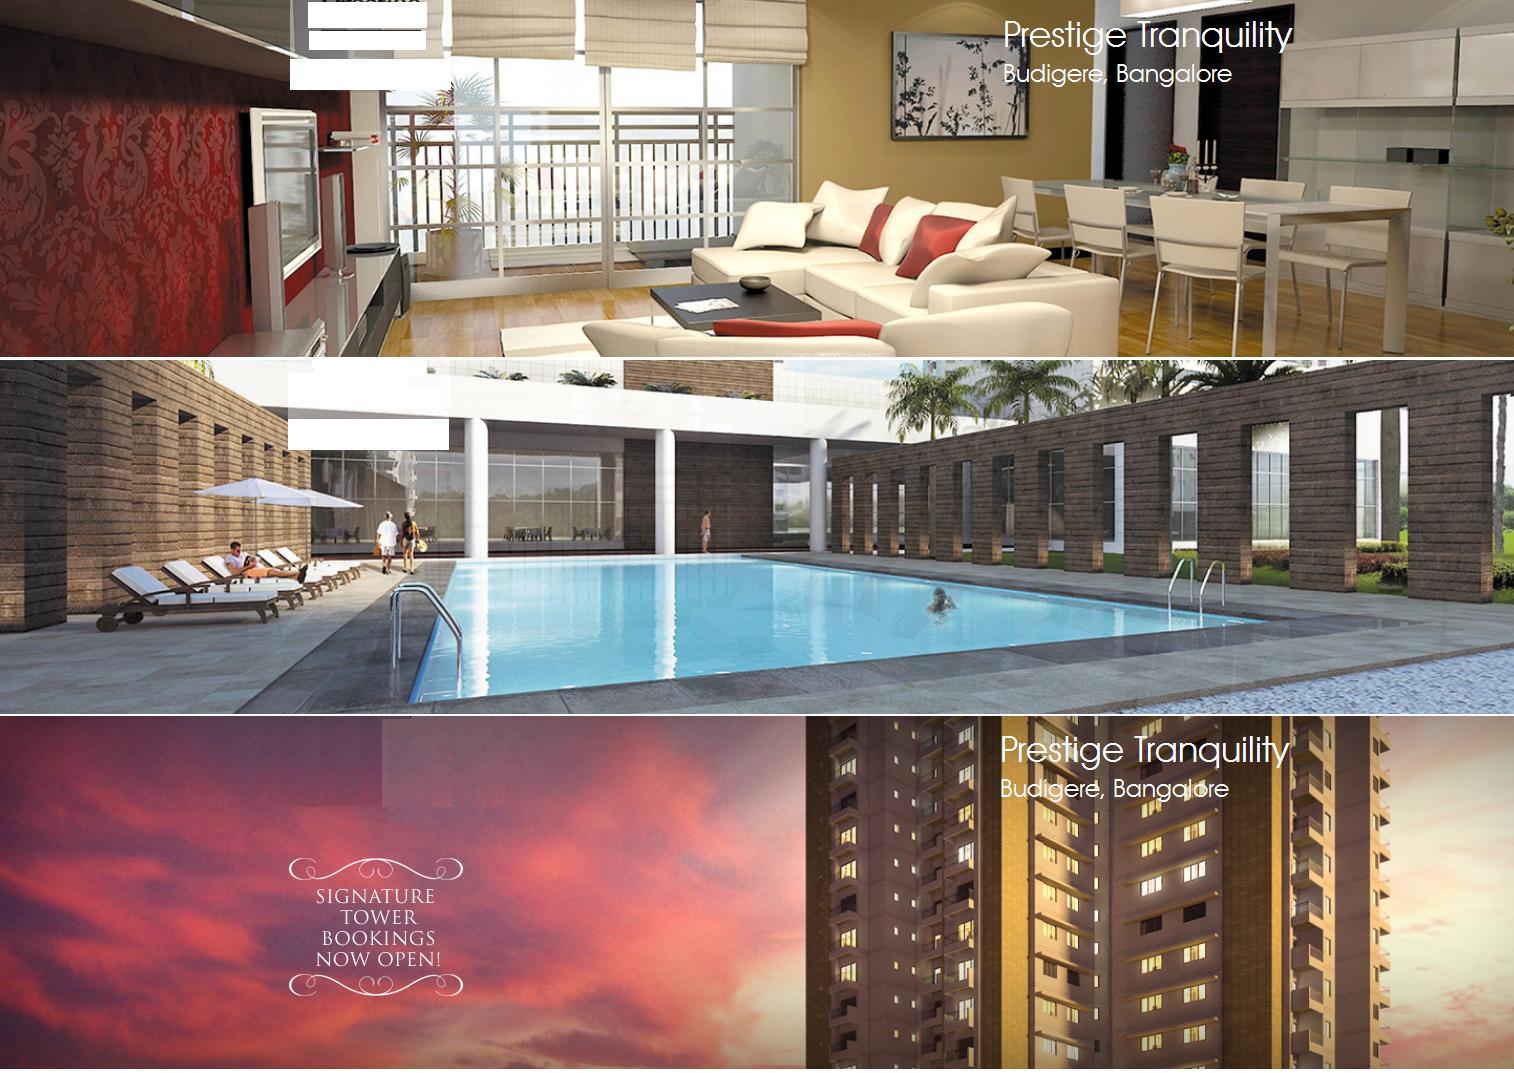 Prestige Tranquility Bangalore